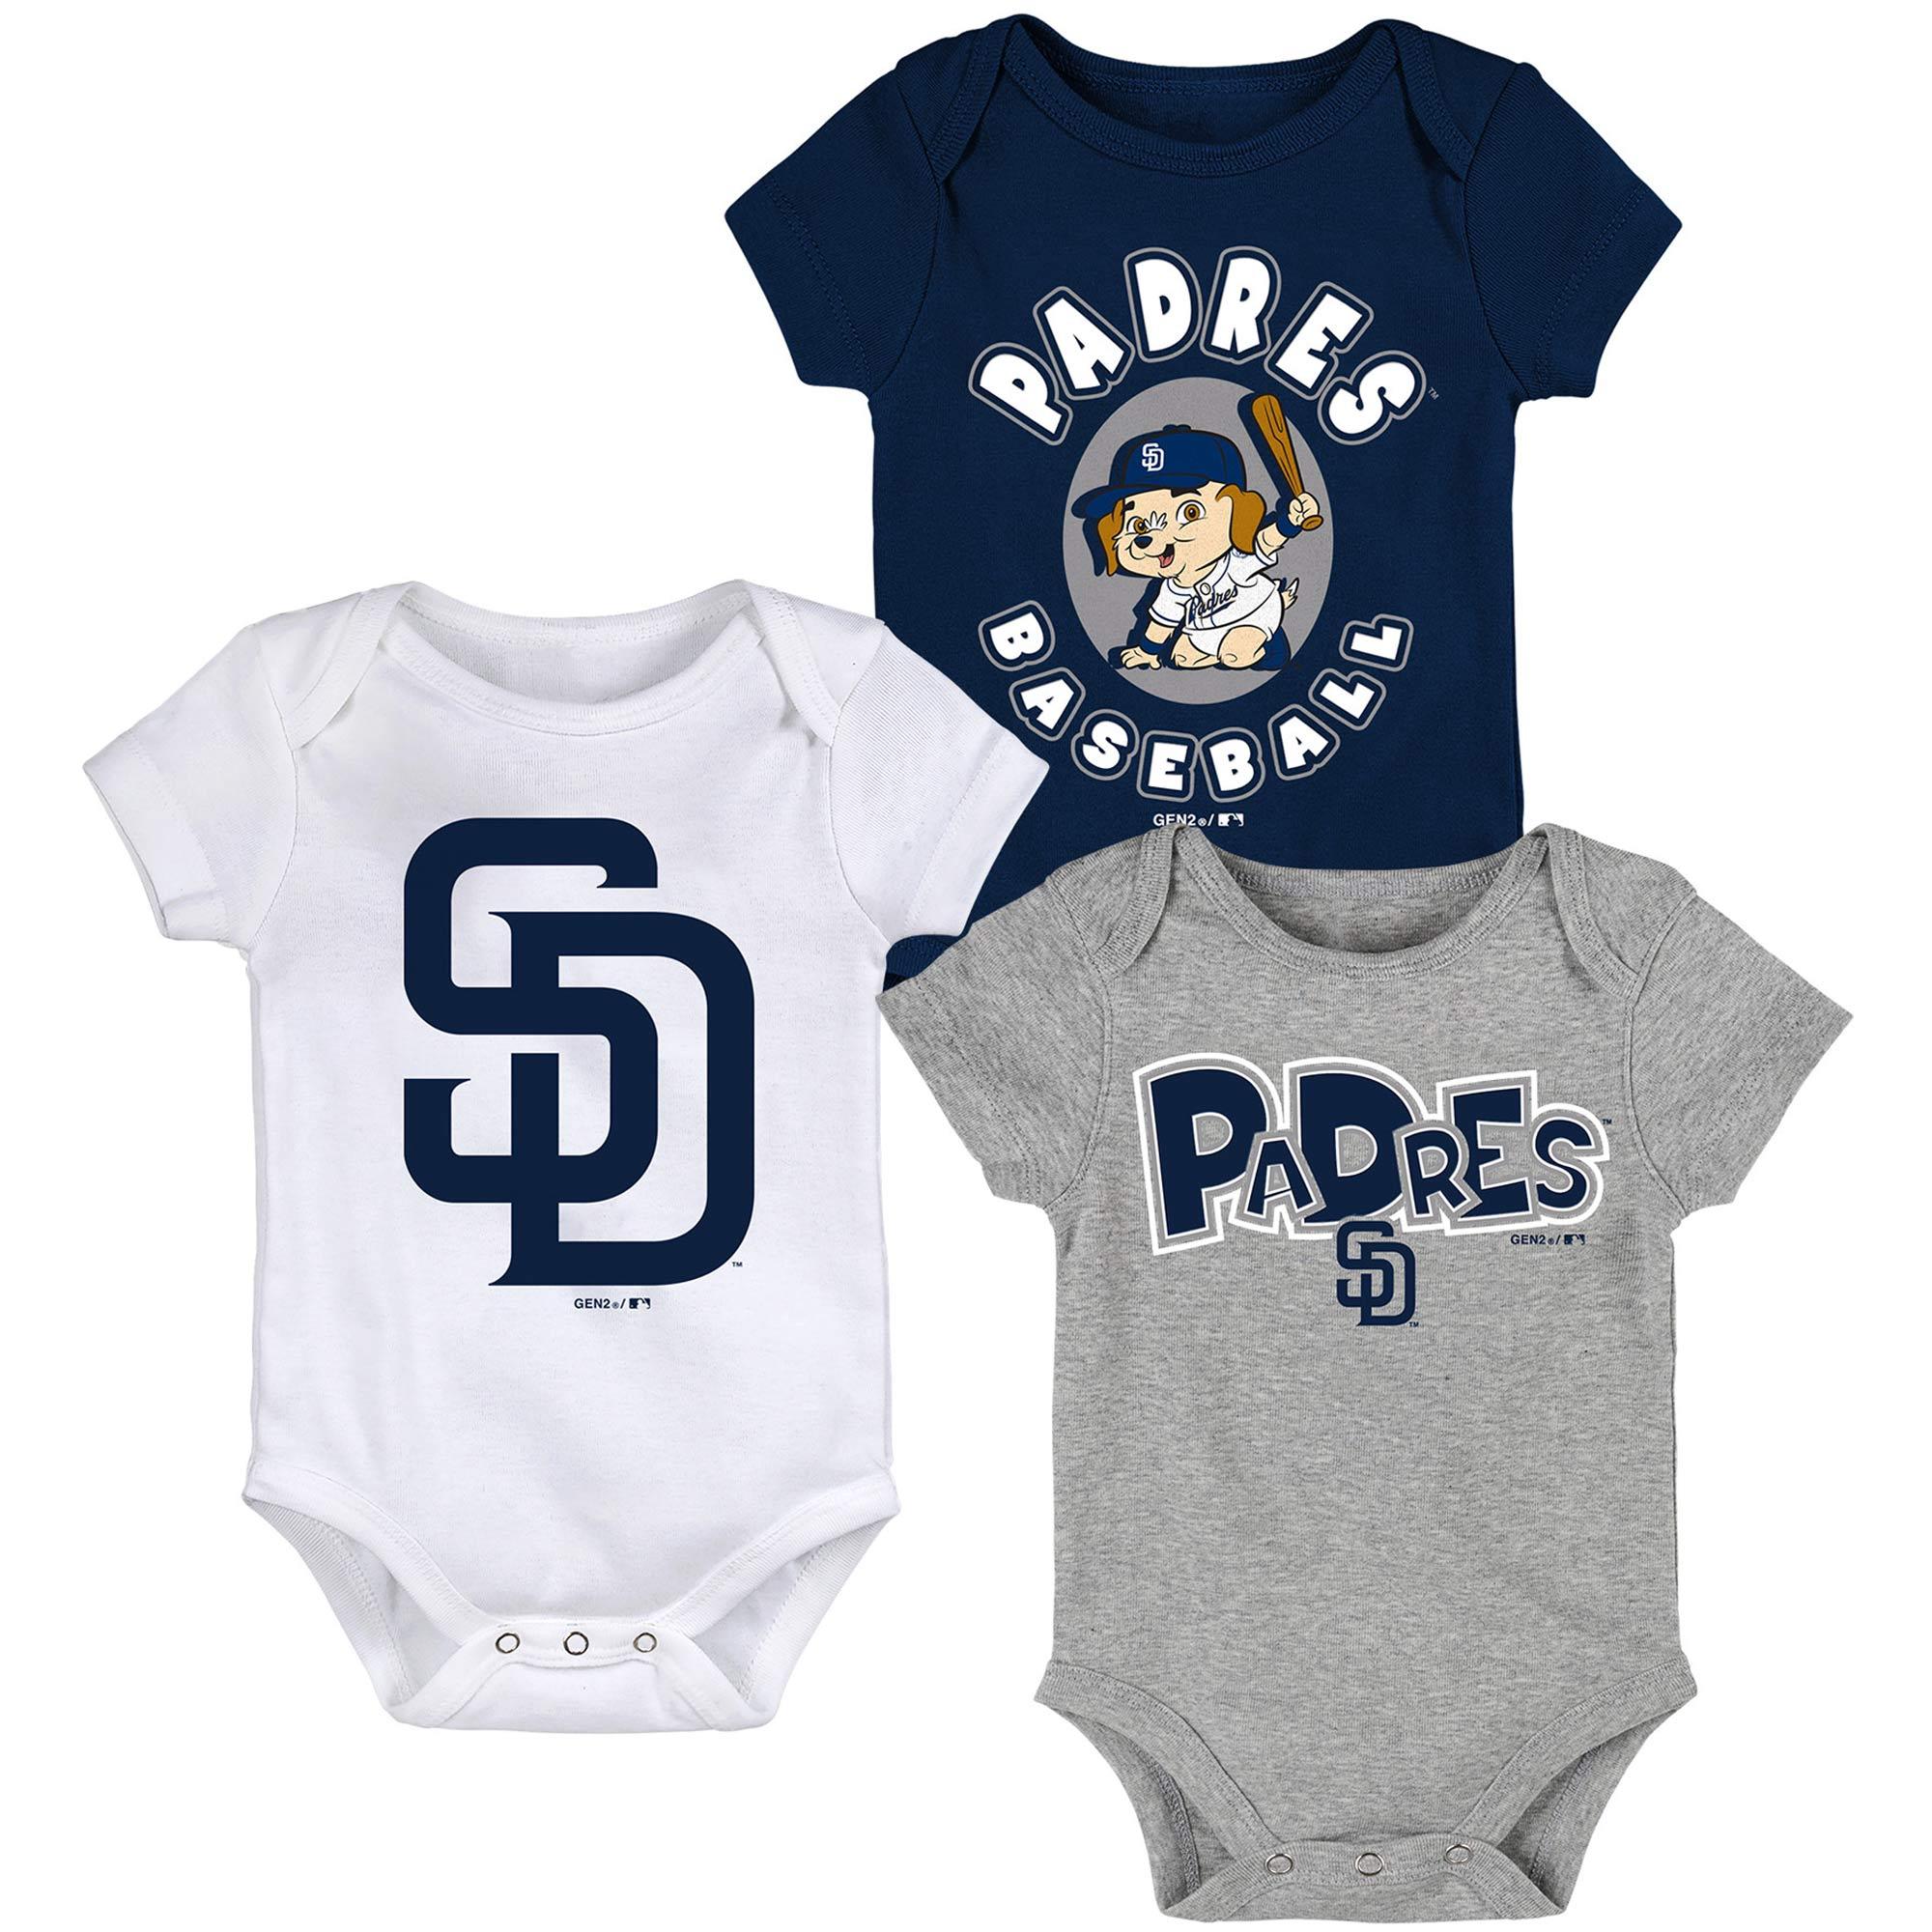 San Diego Padres Newborn & Infant Everyday Fan Three-Pack Bodysuit Set - Navy/White/Gray